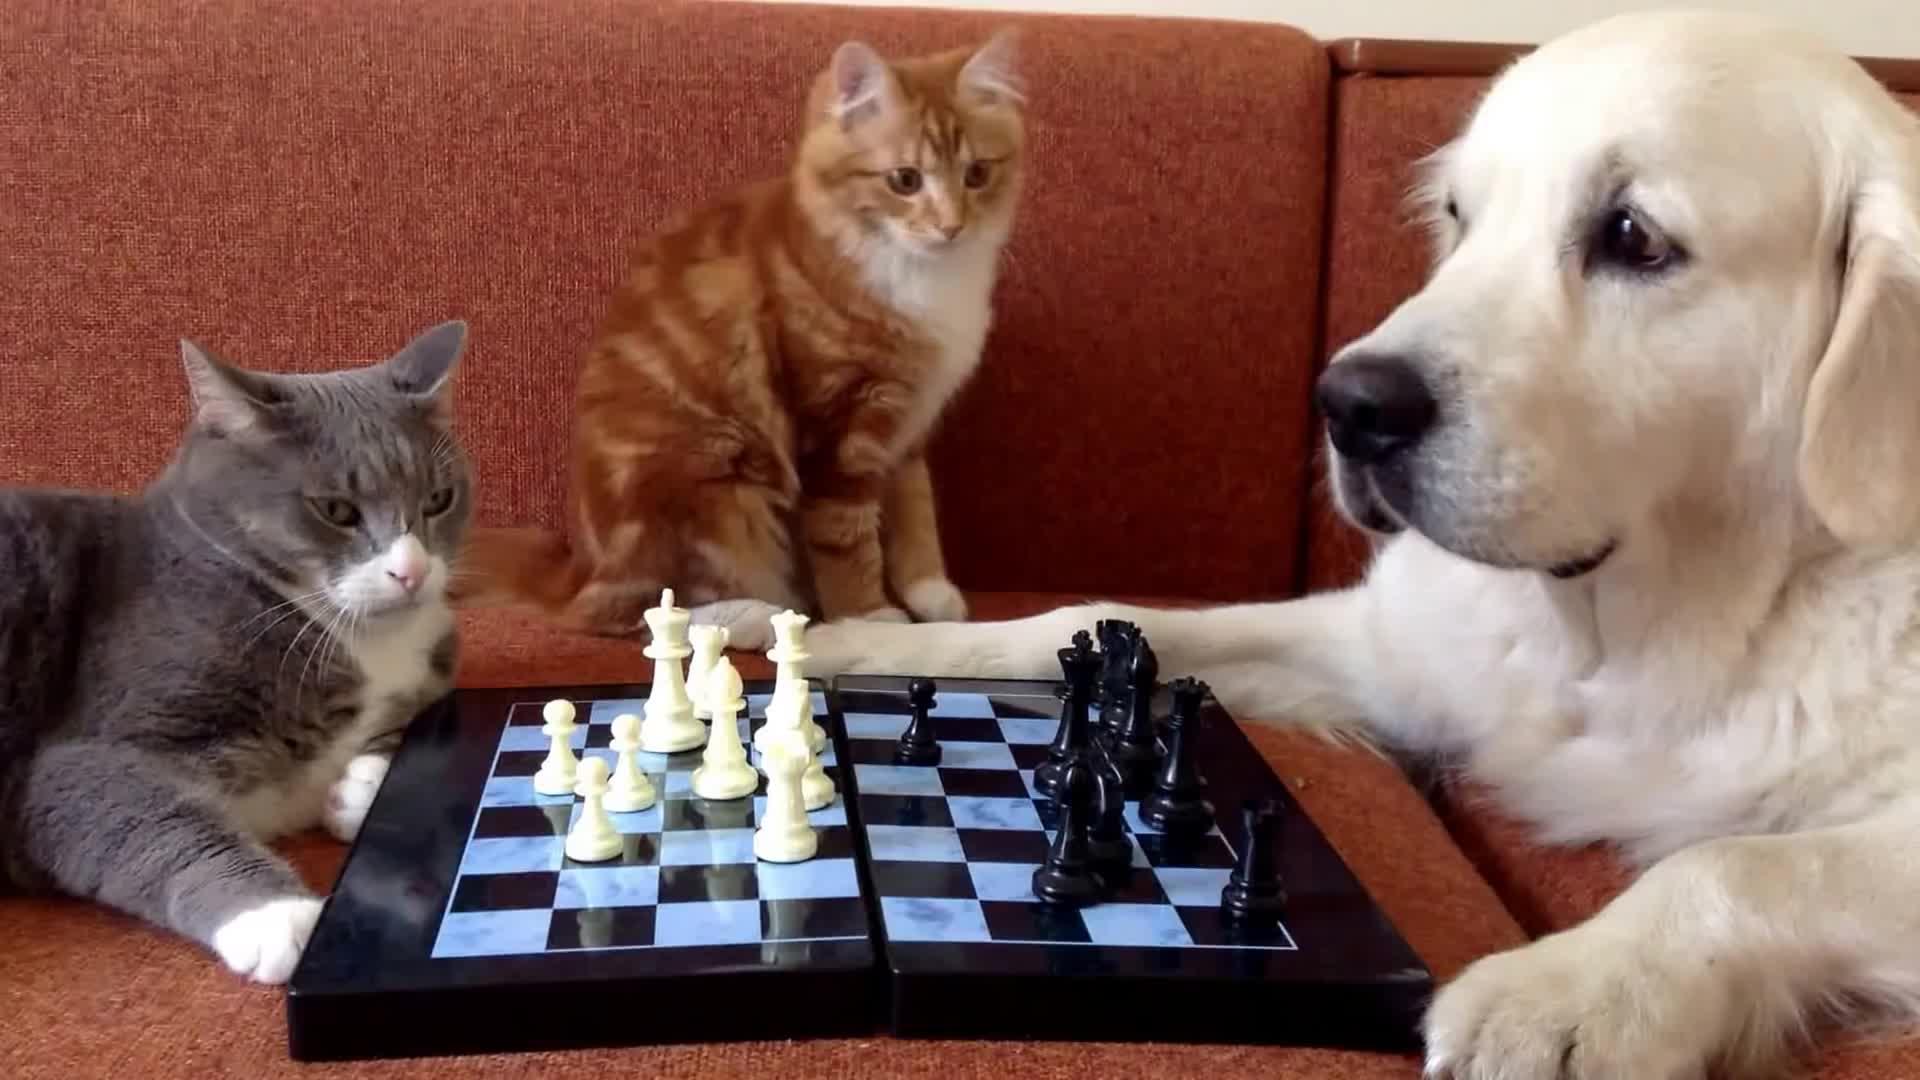 chess, game, ira nosik, гав, голден, золотистый ретривер играет в шахматы, кот, кот играет в шахматы, коты, кошка кусака, мур, мяу, приколы с котами, ретривер, собака и кот, собака играет в шахматы, собака играка, собака-терапевт, собаки, шахматы, Cats and dogs playing chess GIFs